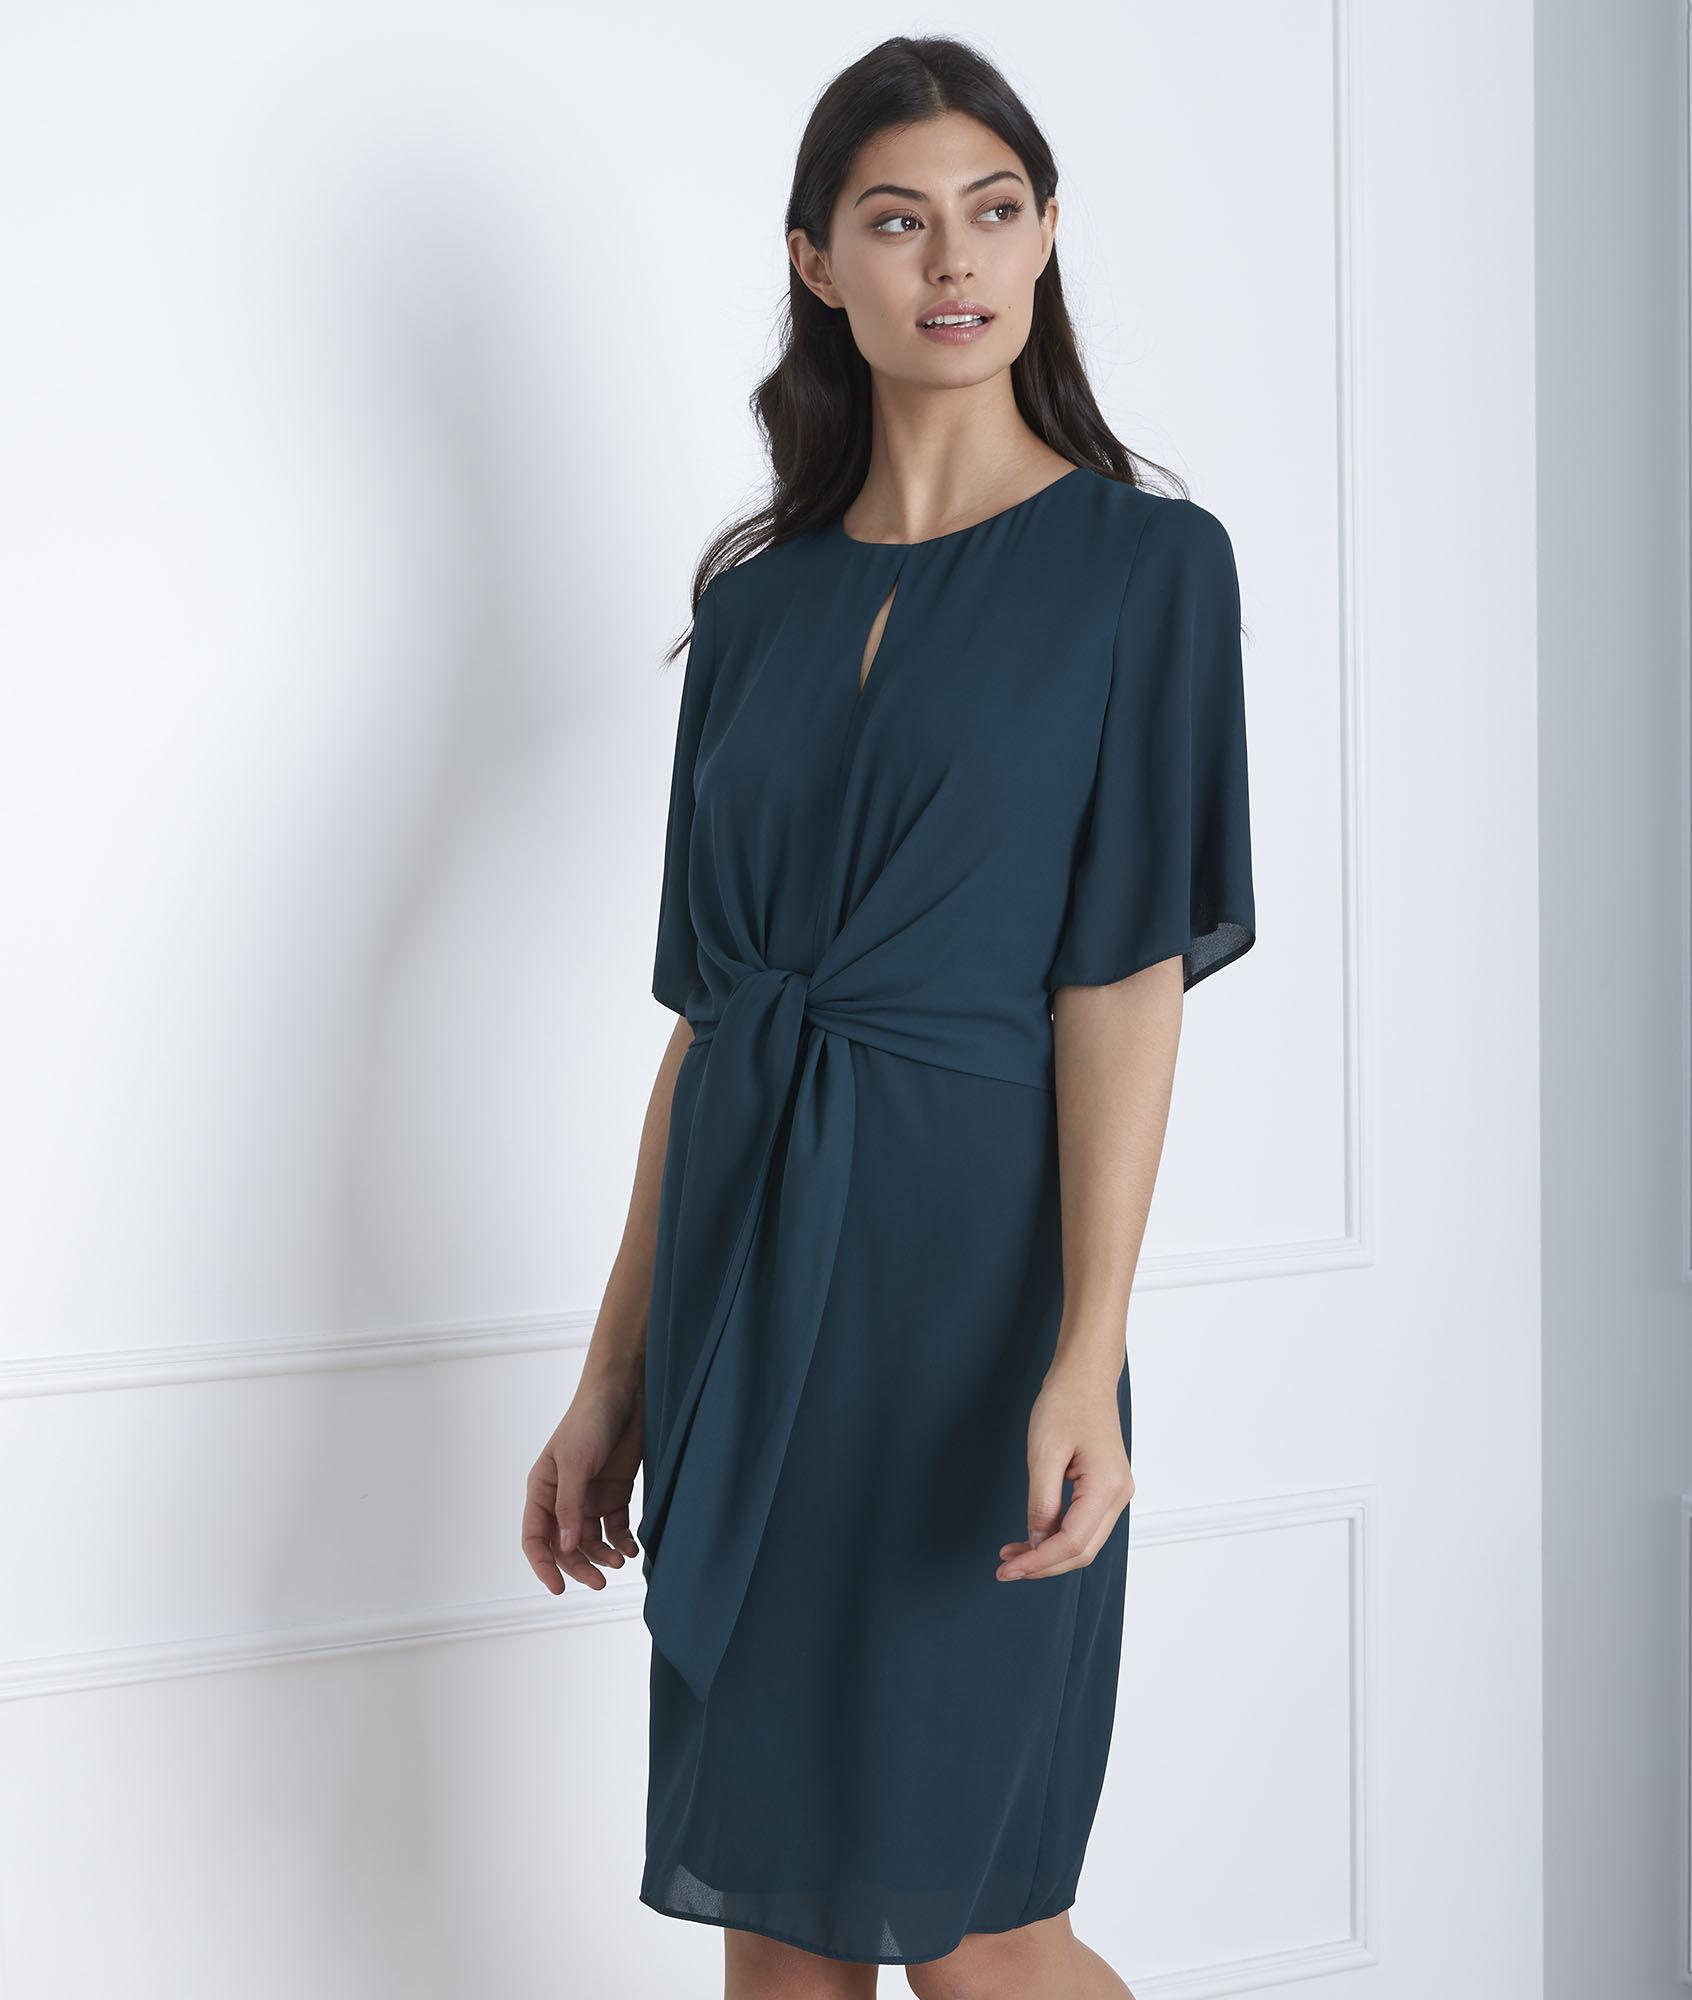 d54bf1c7c362b3 Donkergroene gedrapeerde jurk Hermine - Maison Cent Vingt-Trois